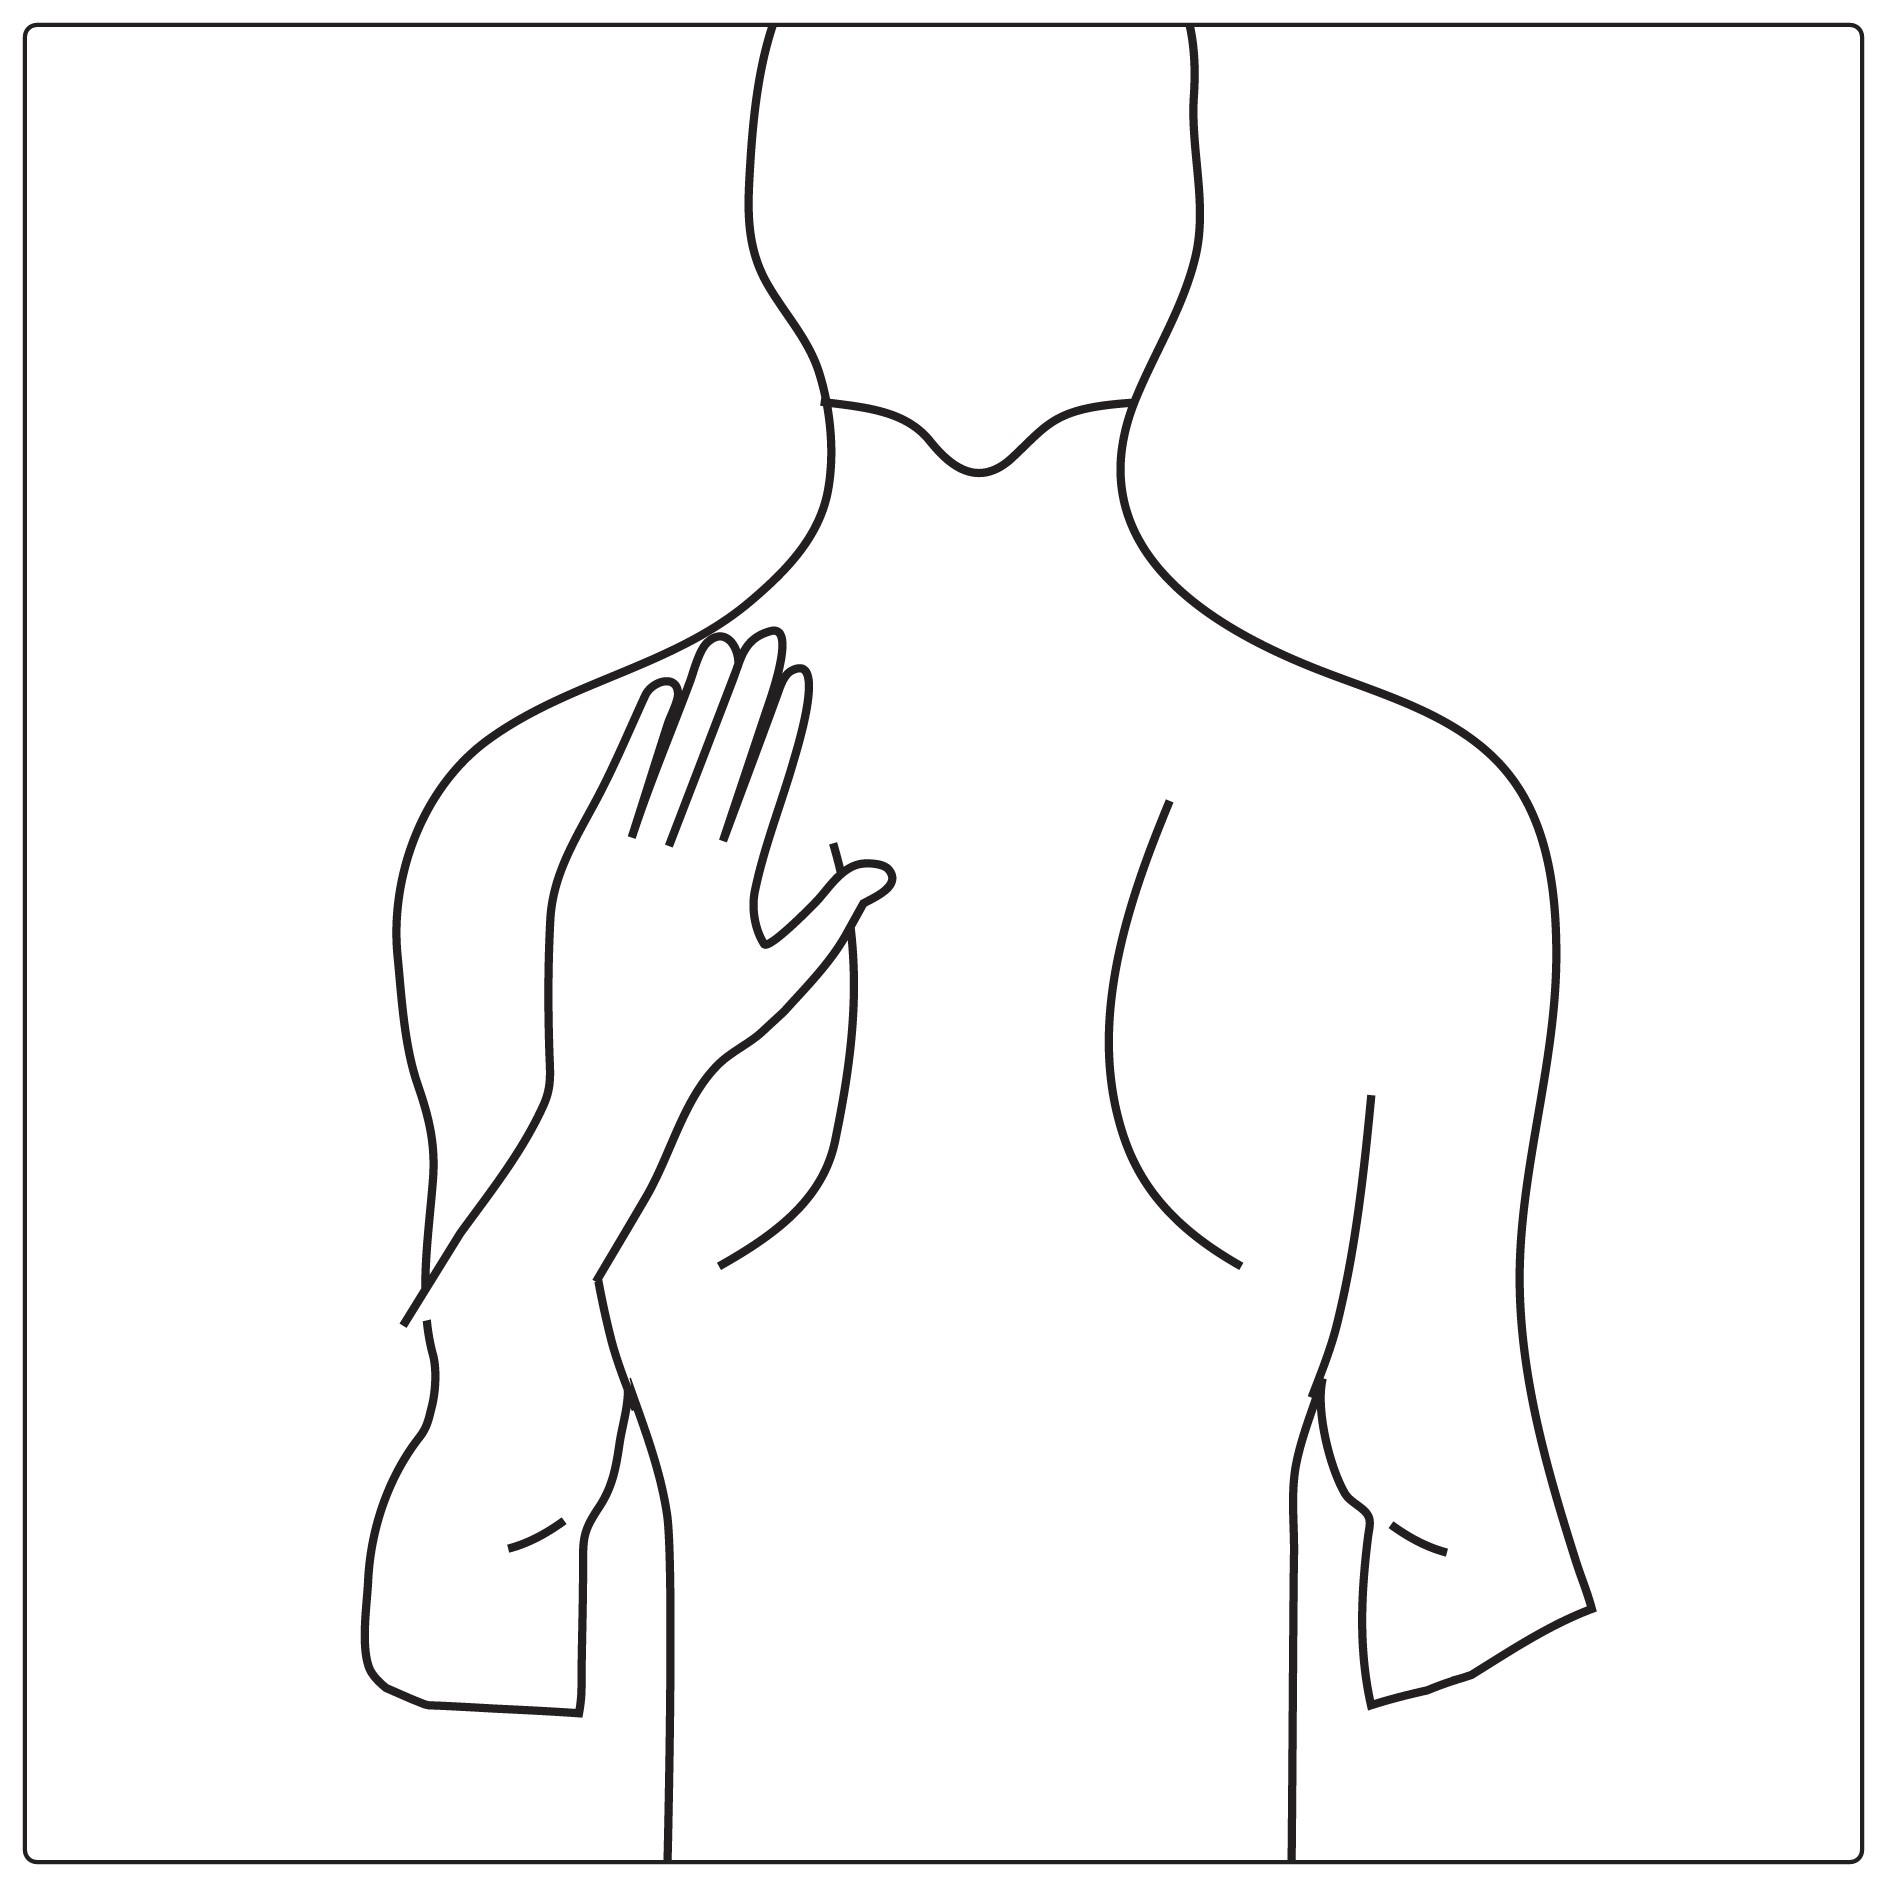 Tryck depotplåstret mot huden